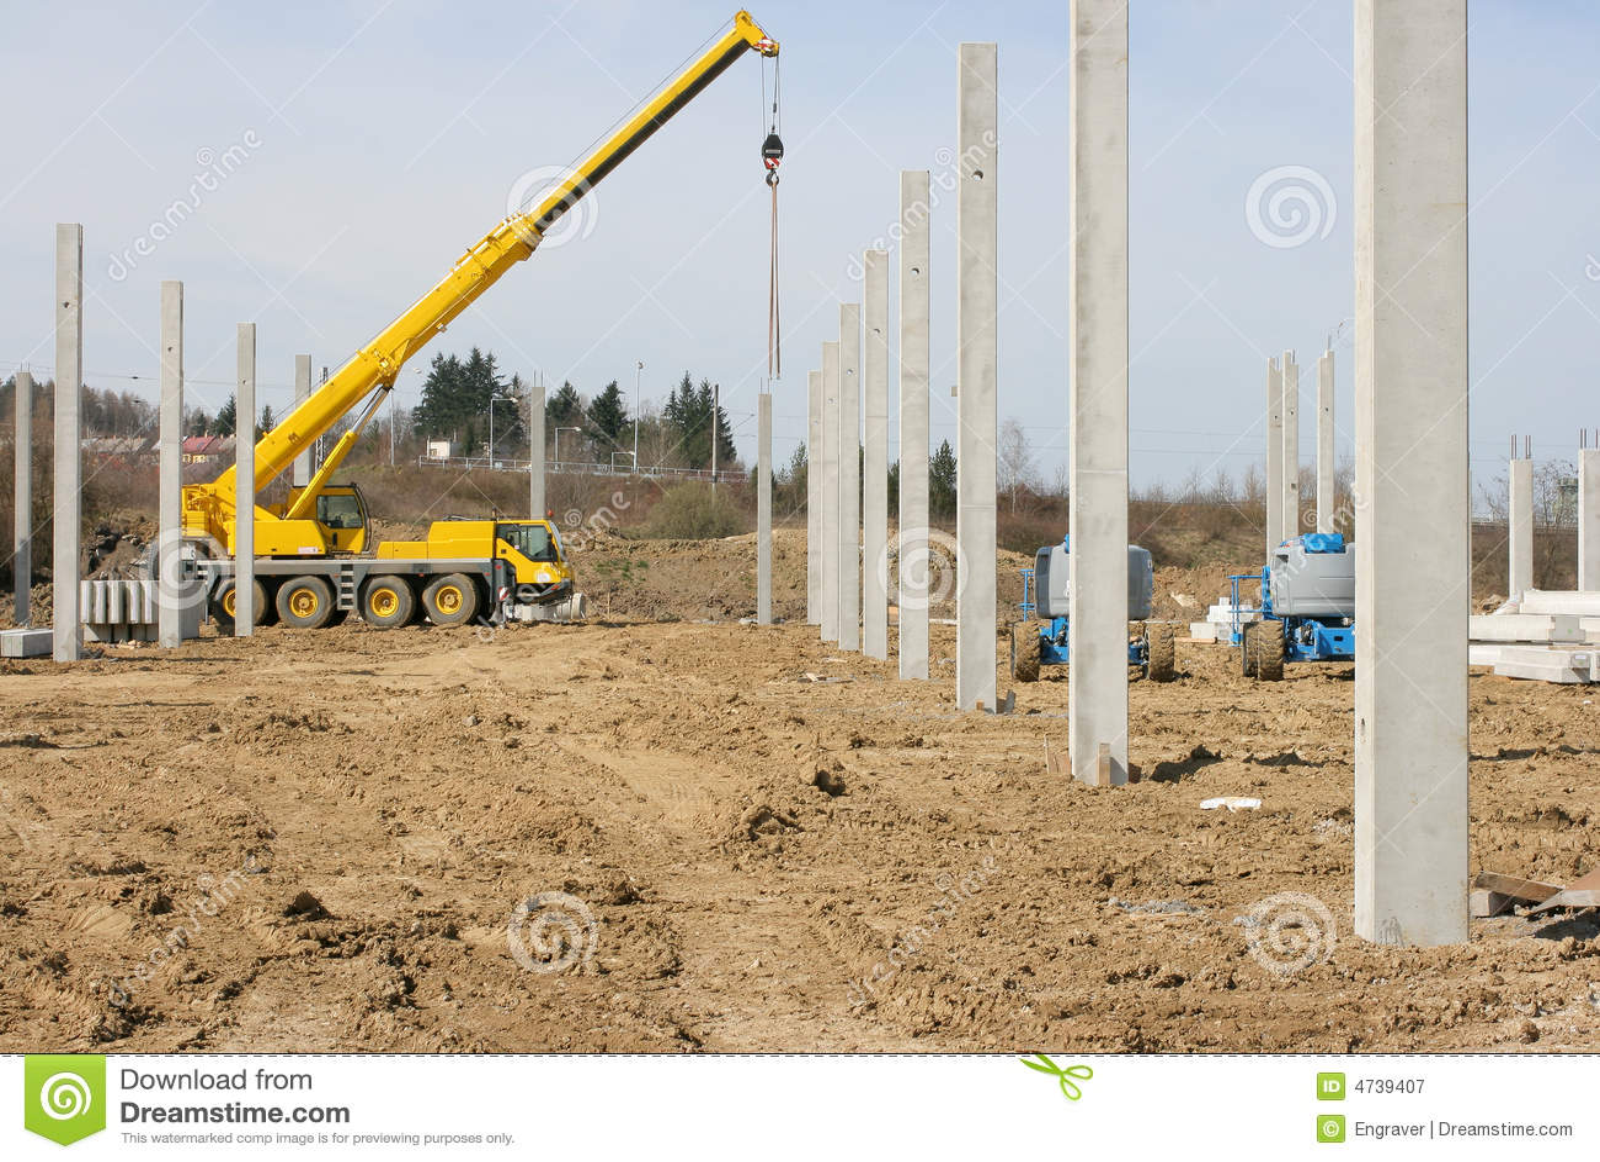 Pillar Concrete Buildings : Concrete pillar construction royalty free stock